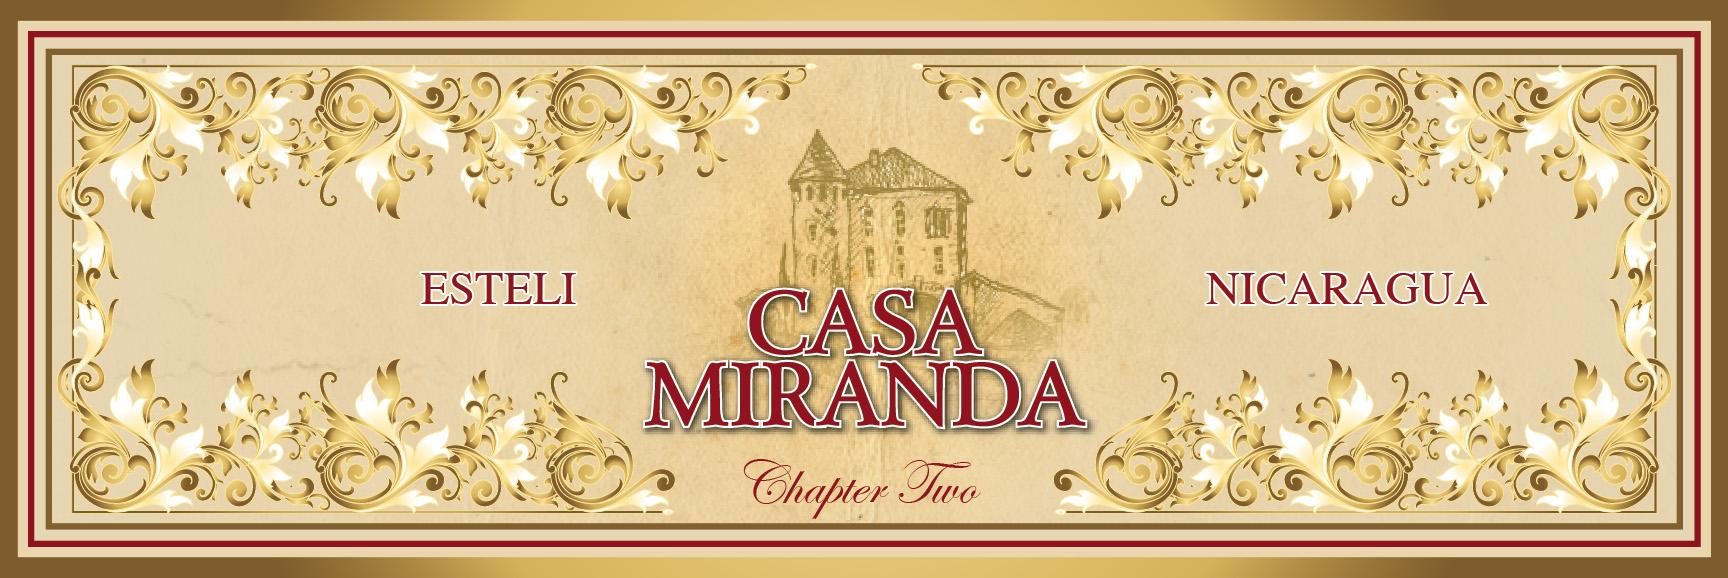 Casa Miranda Chapter Two